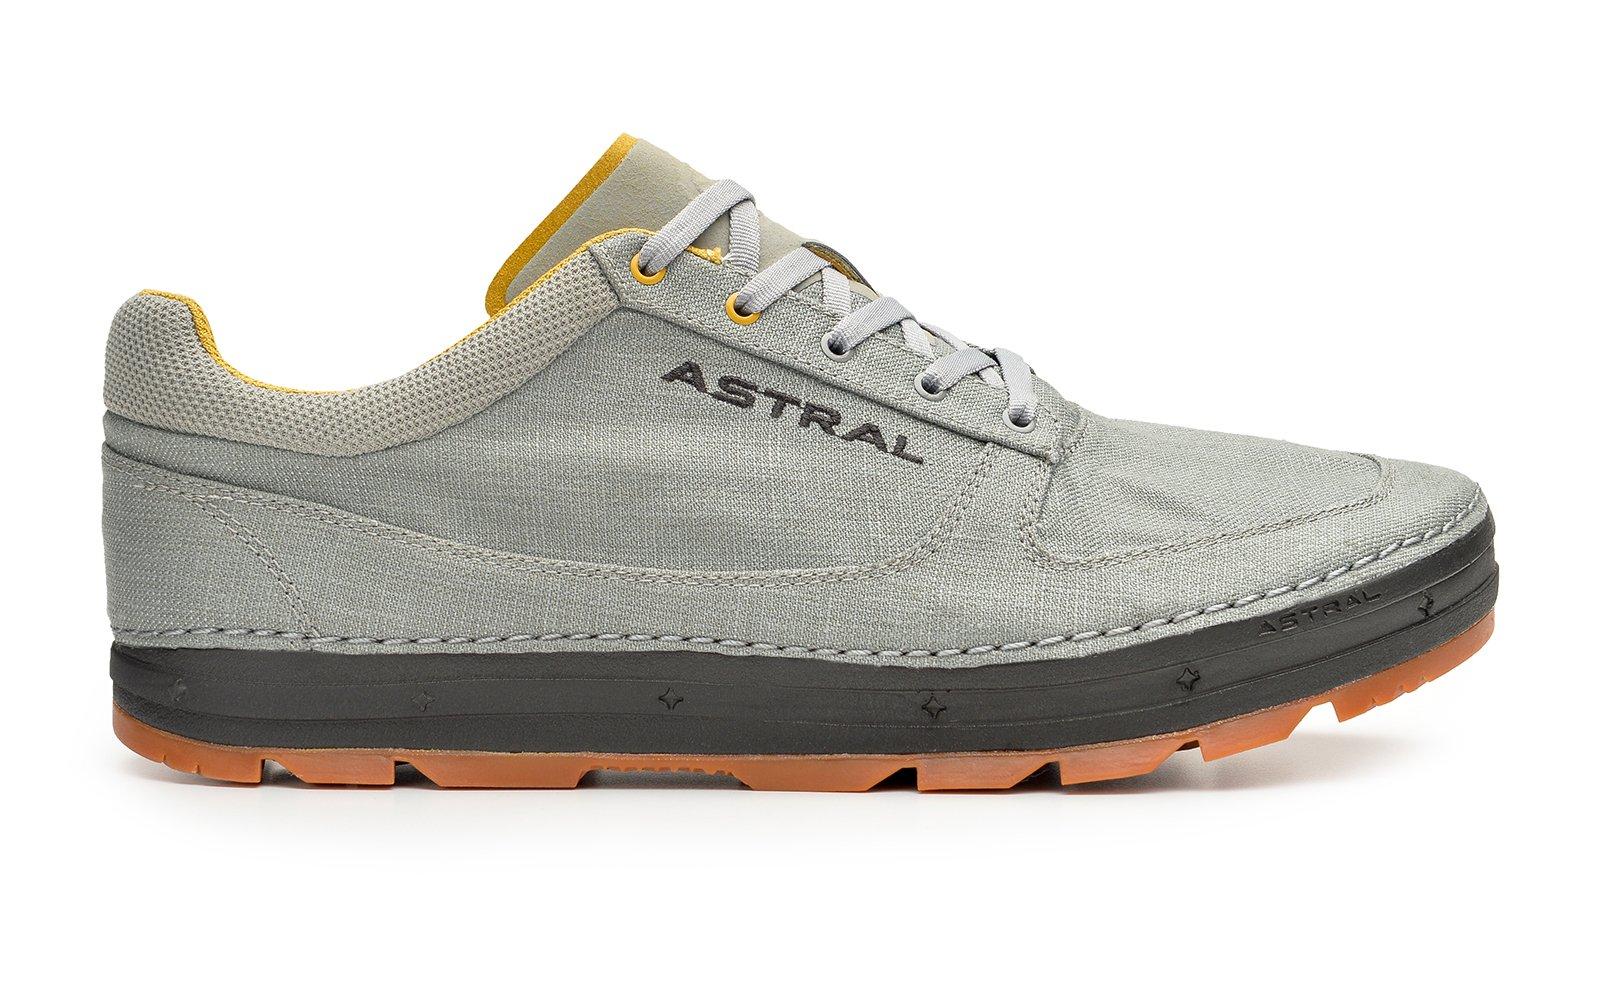 Astral Hemp Donner Men's Water Hiking Shoe - Gray/Black - M9